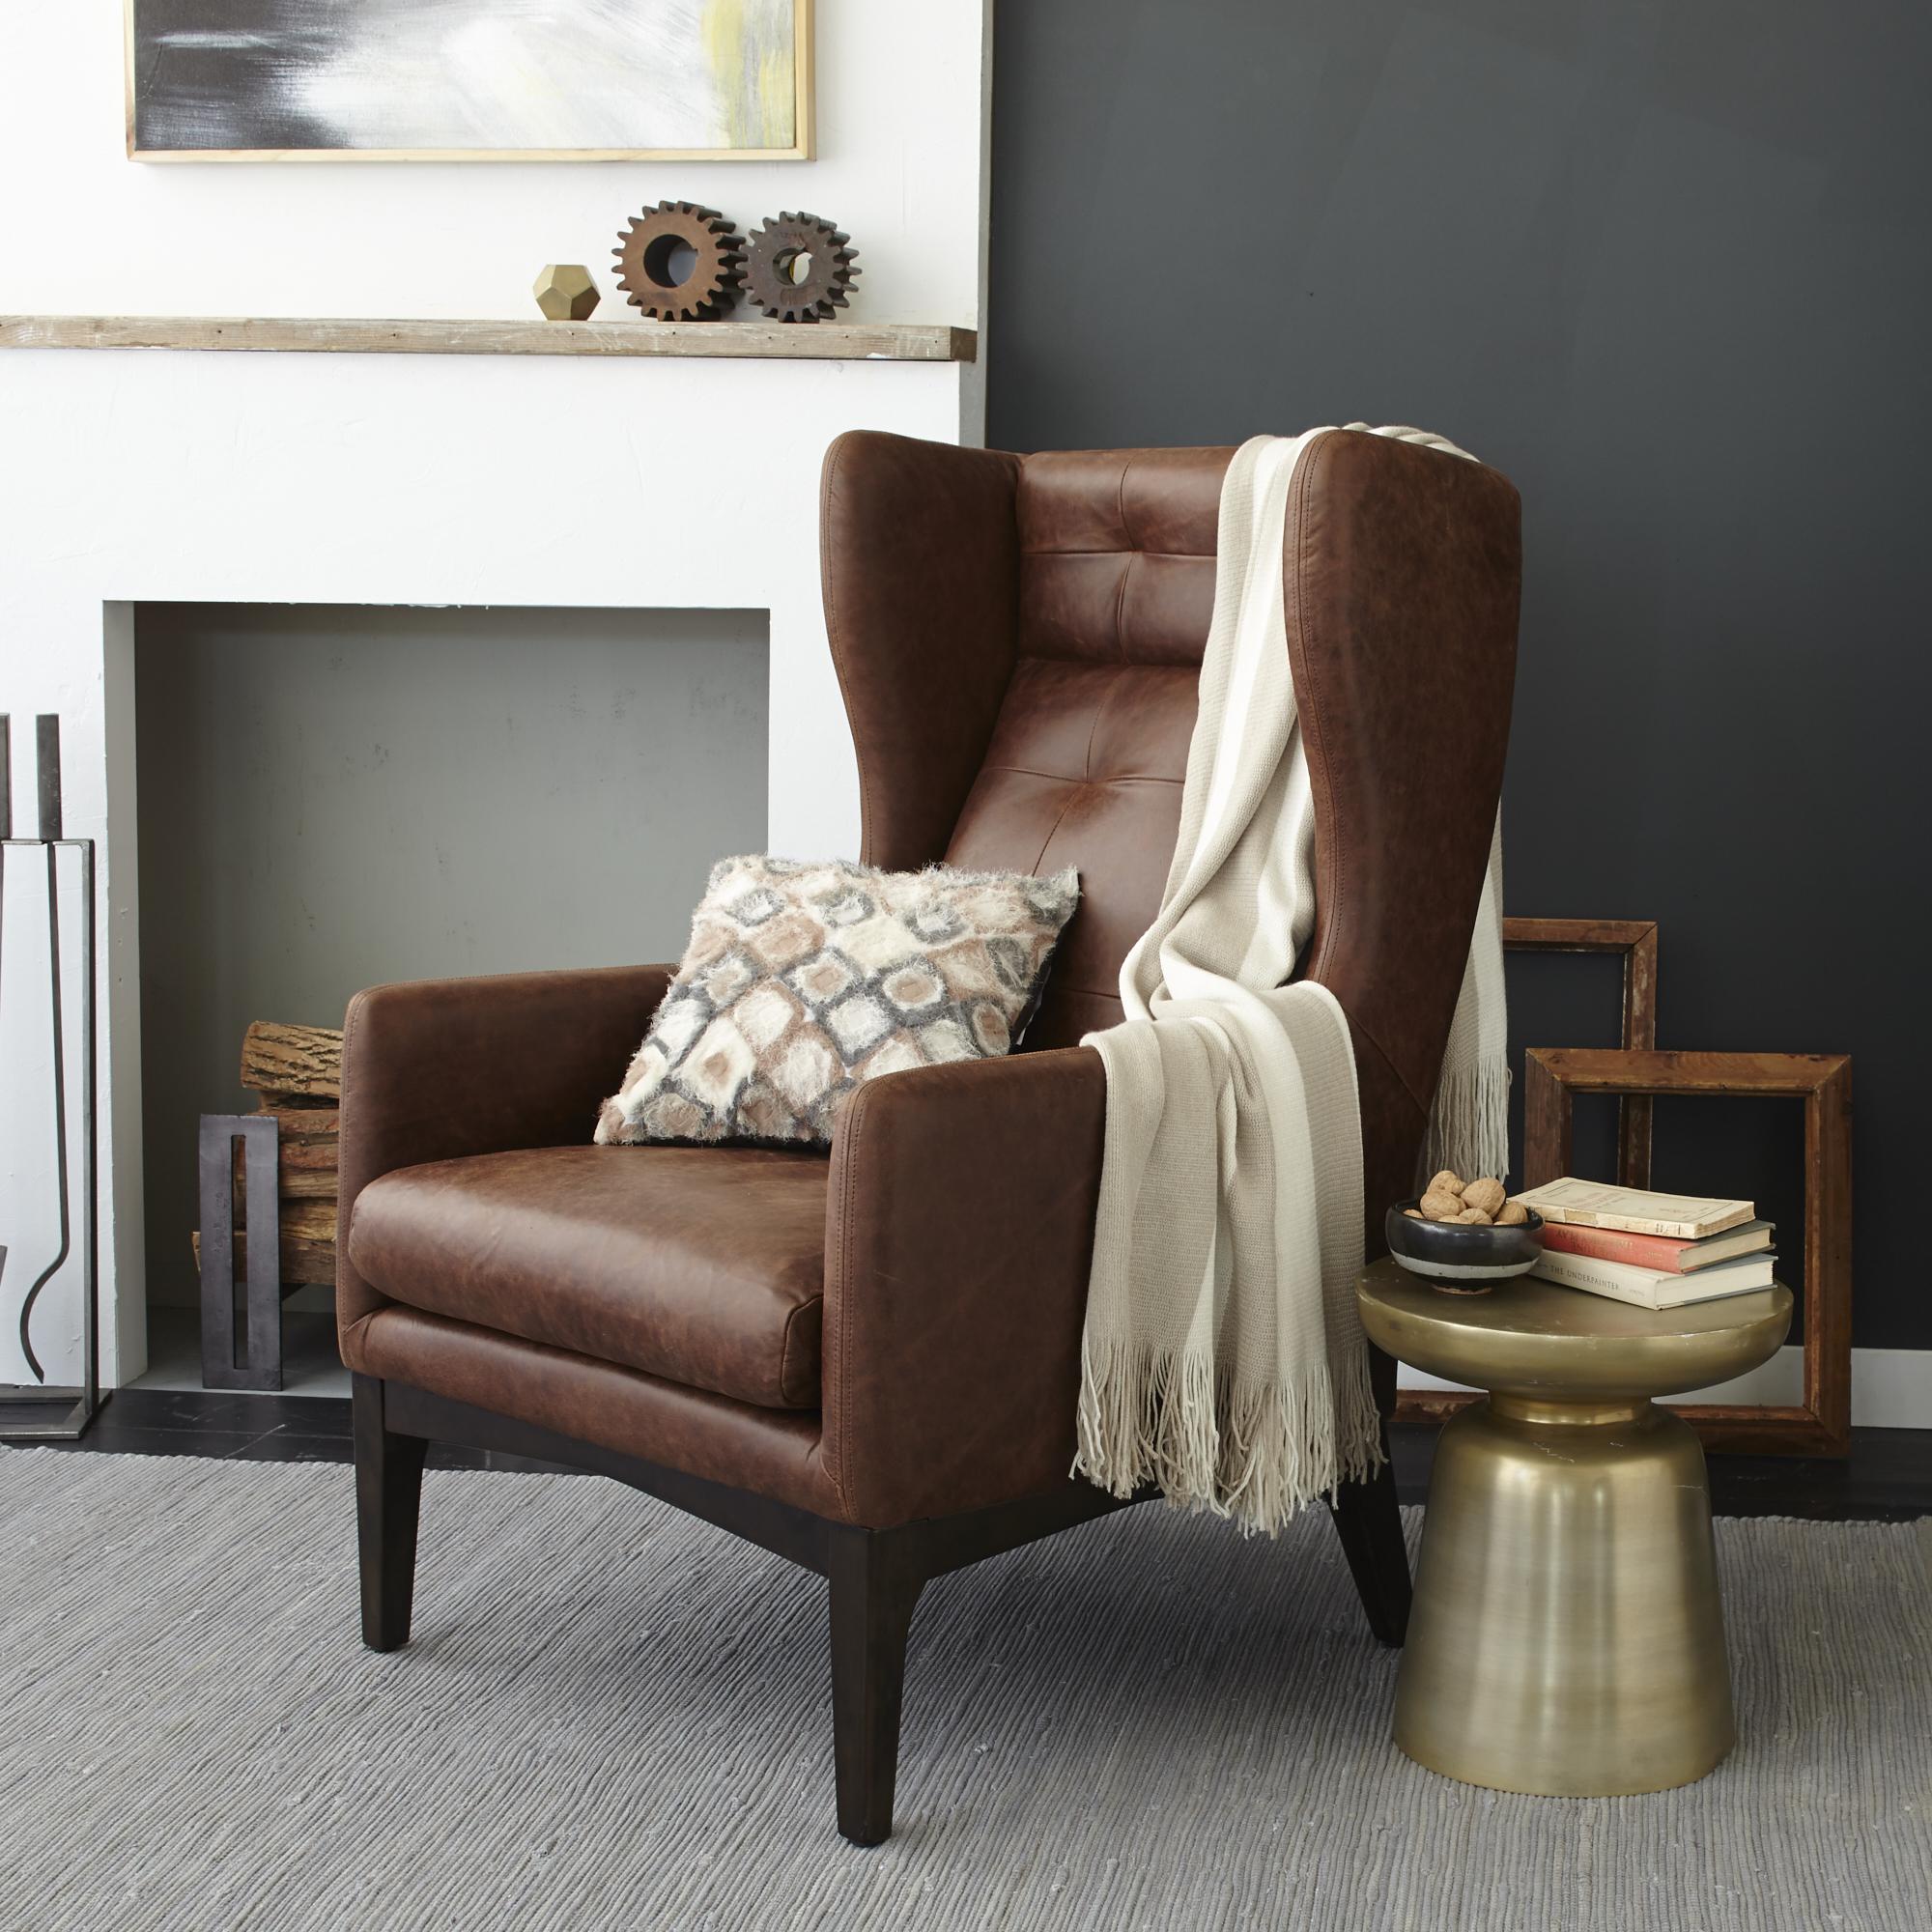 pip-james-harrison-winged-chair-fa14-144.jpg